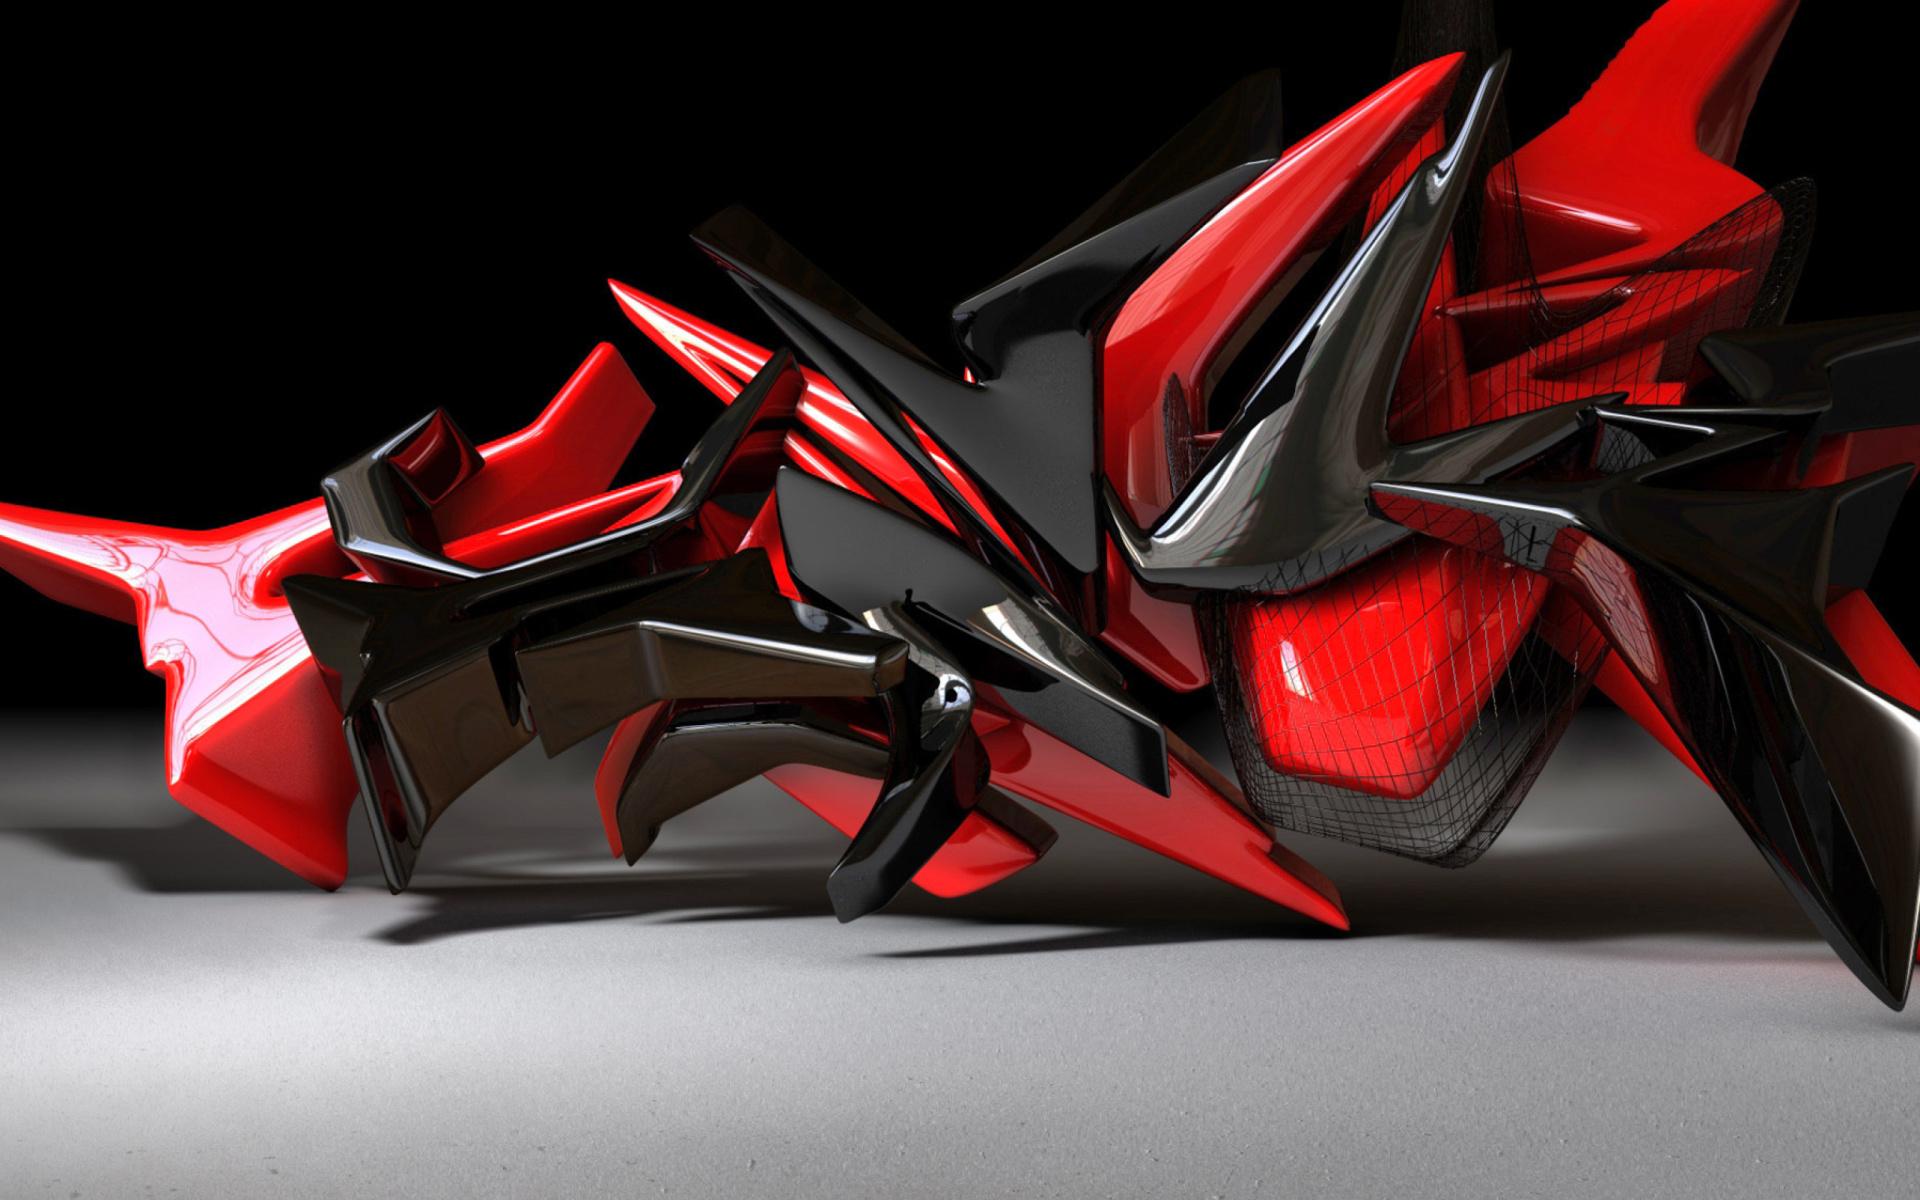 Black And Red 3d Design Wallpaper For Widescreen Desktop